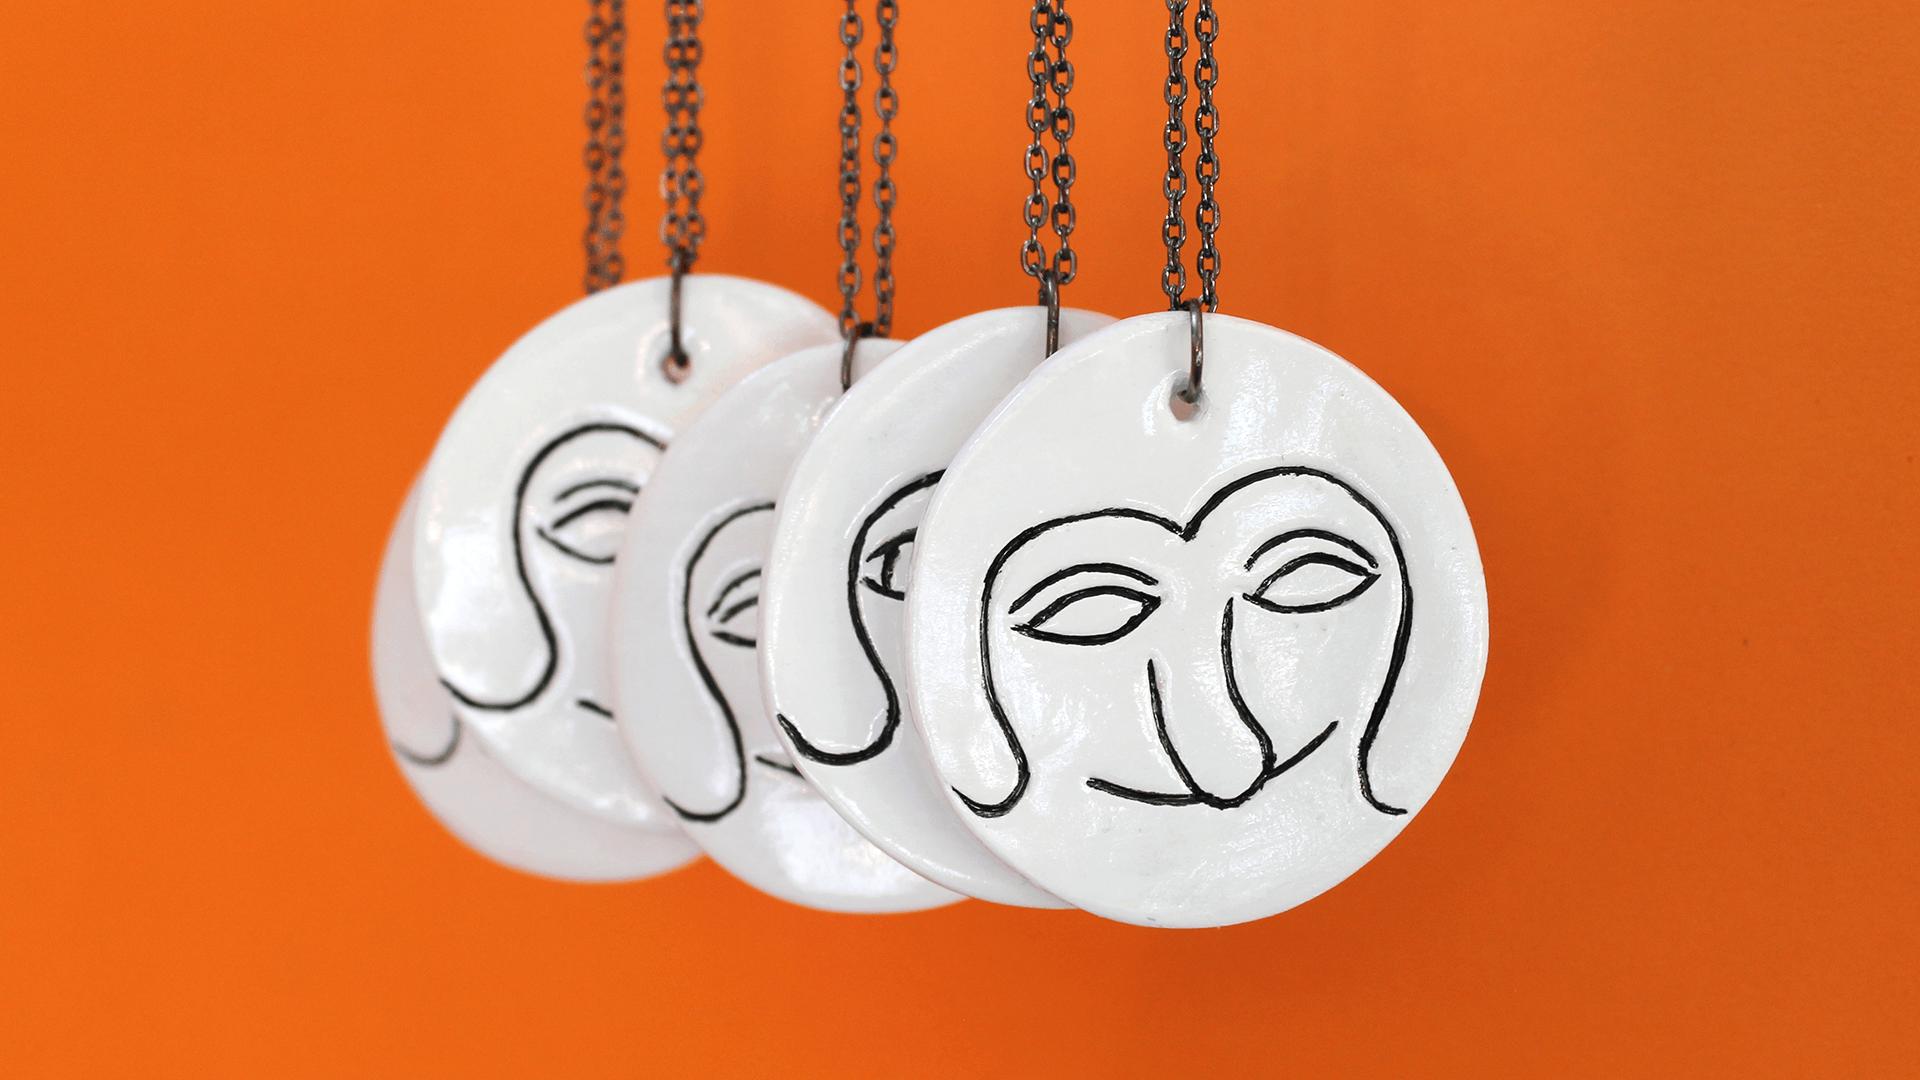 Studio Goof Julia Boehme Goof Medal Pendant Clay Ceramics Illustration Jewellery Ceramics Leipzig